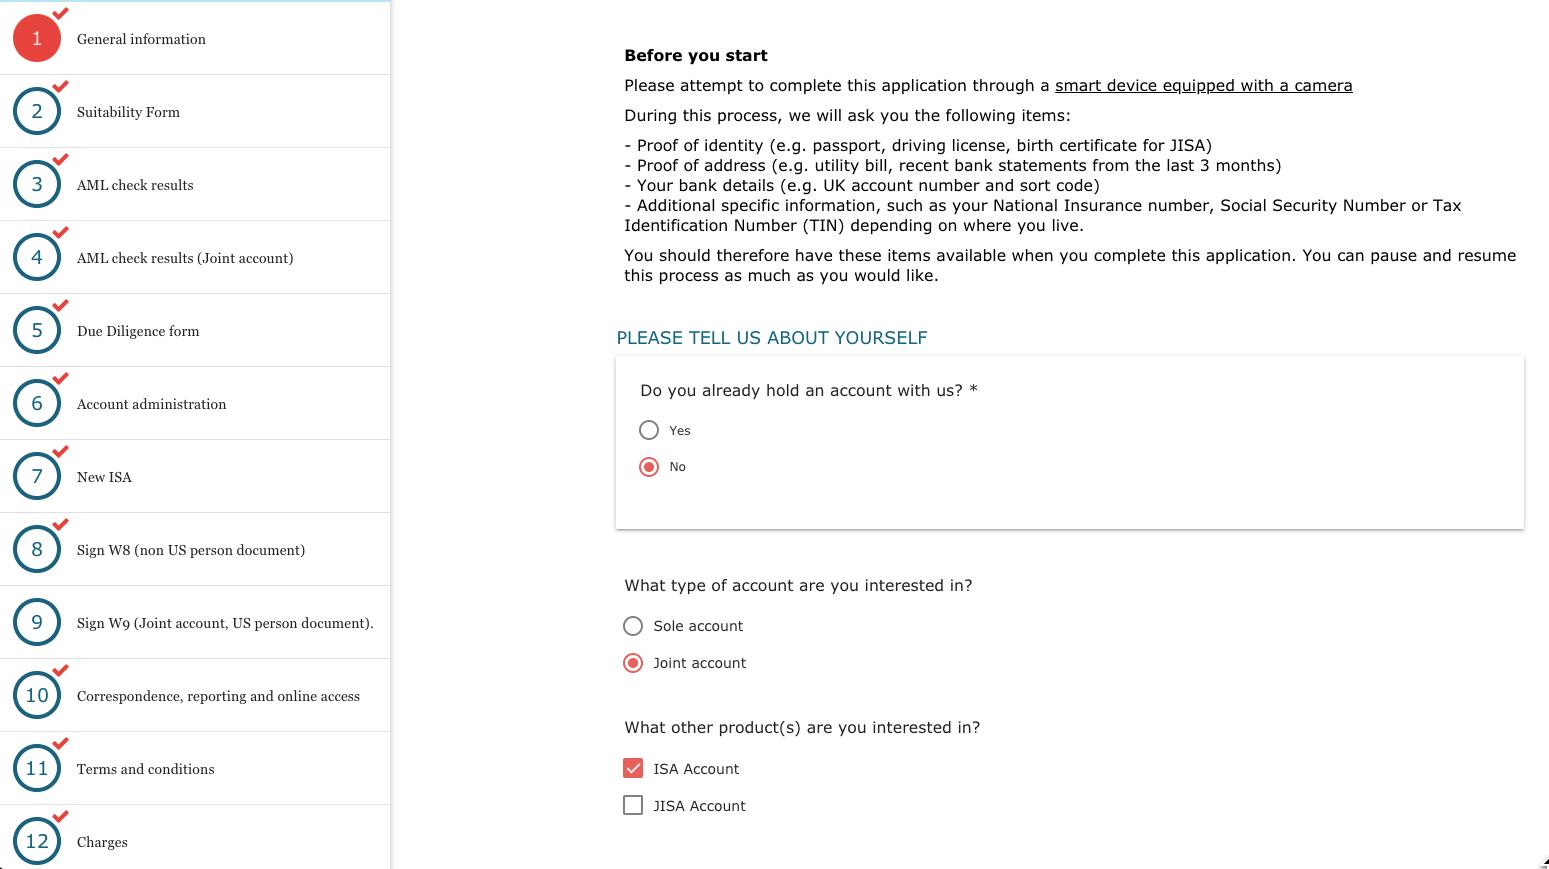 MyDocSafe client workflow for wealth management